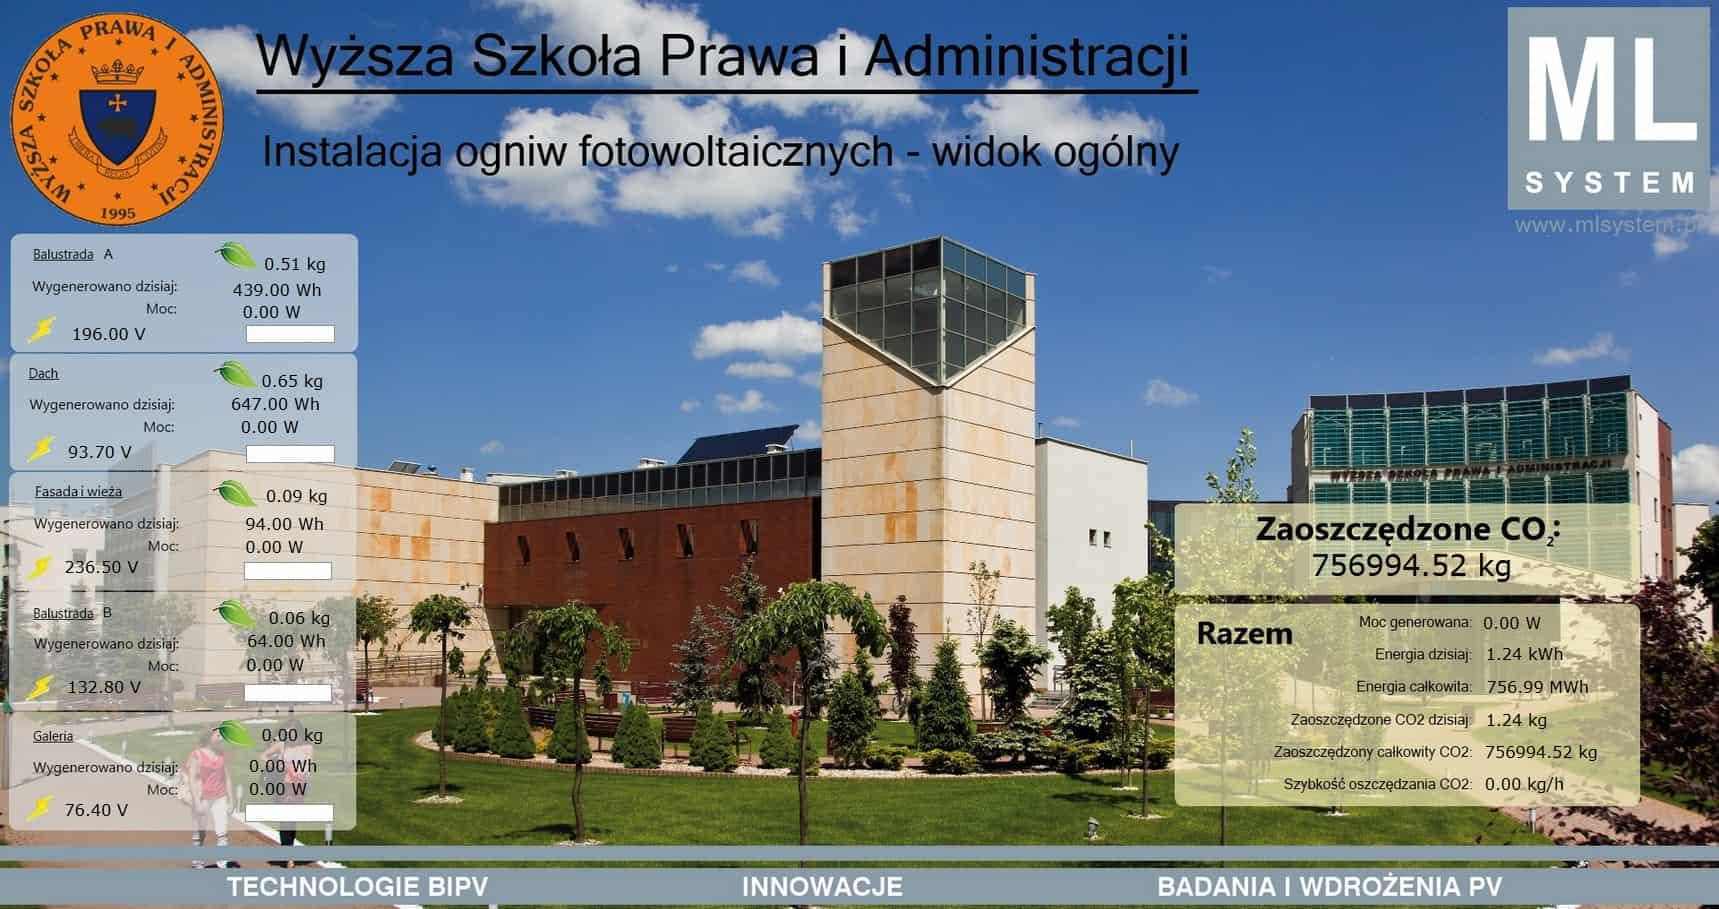 Rzeszów / University of Law and Public Administration